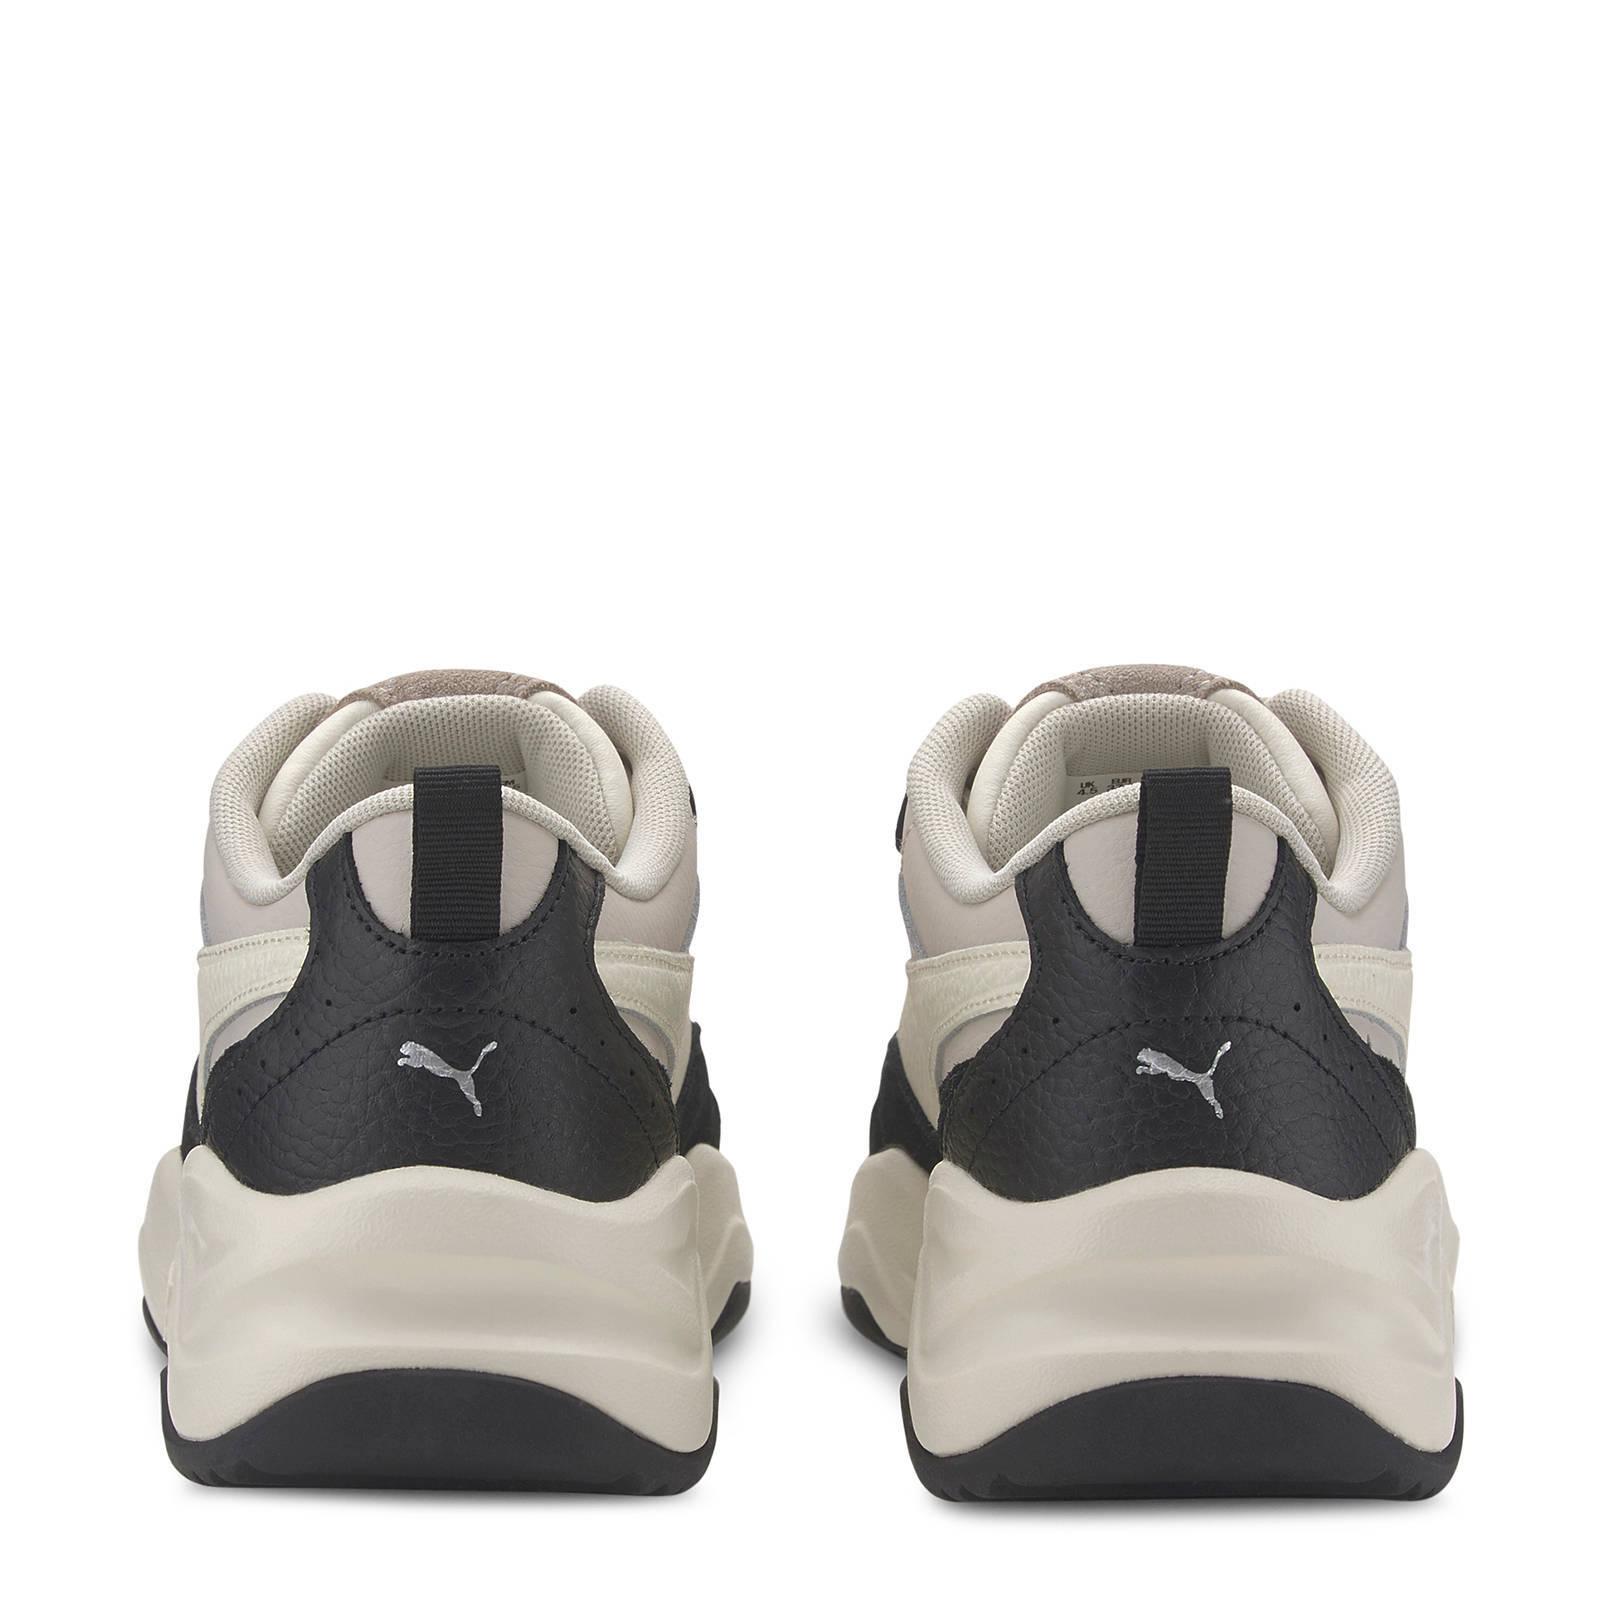 Puma Cilia Lux sneakers zwart/wit/beige | wehkamp